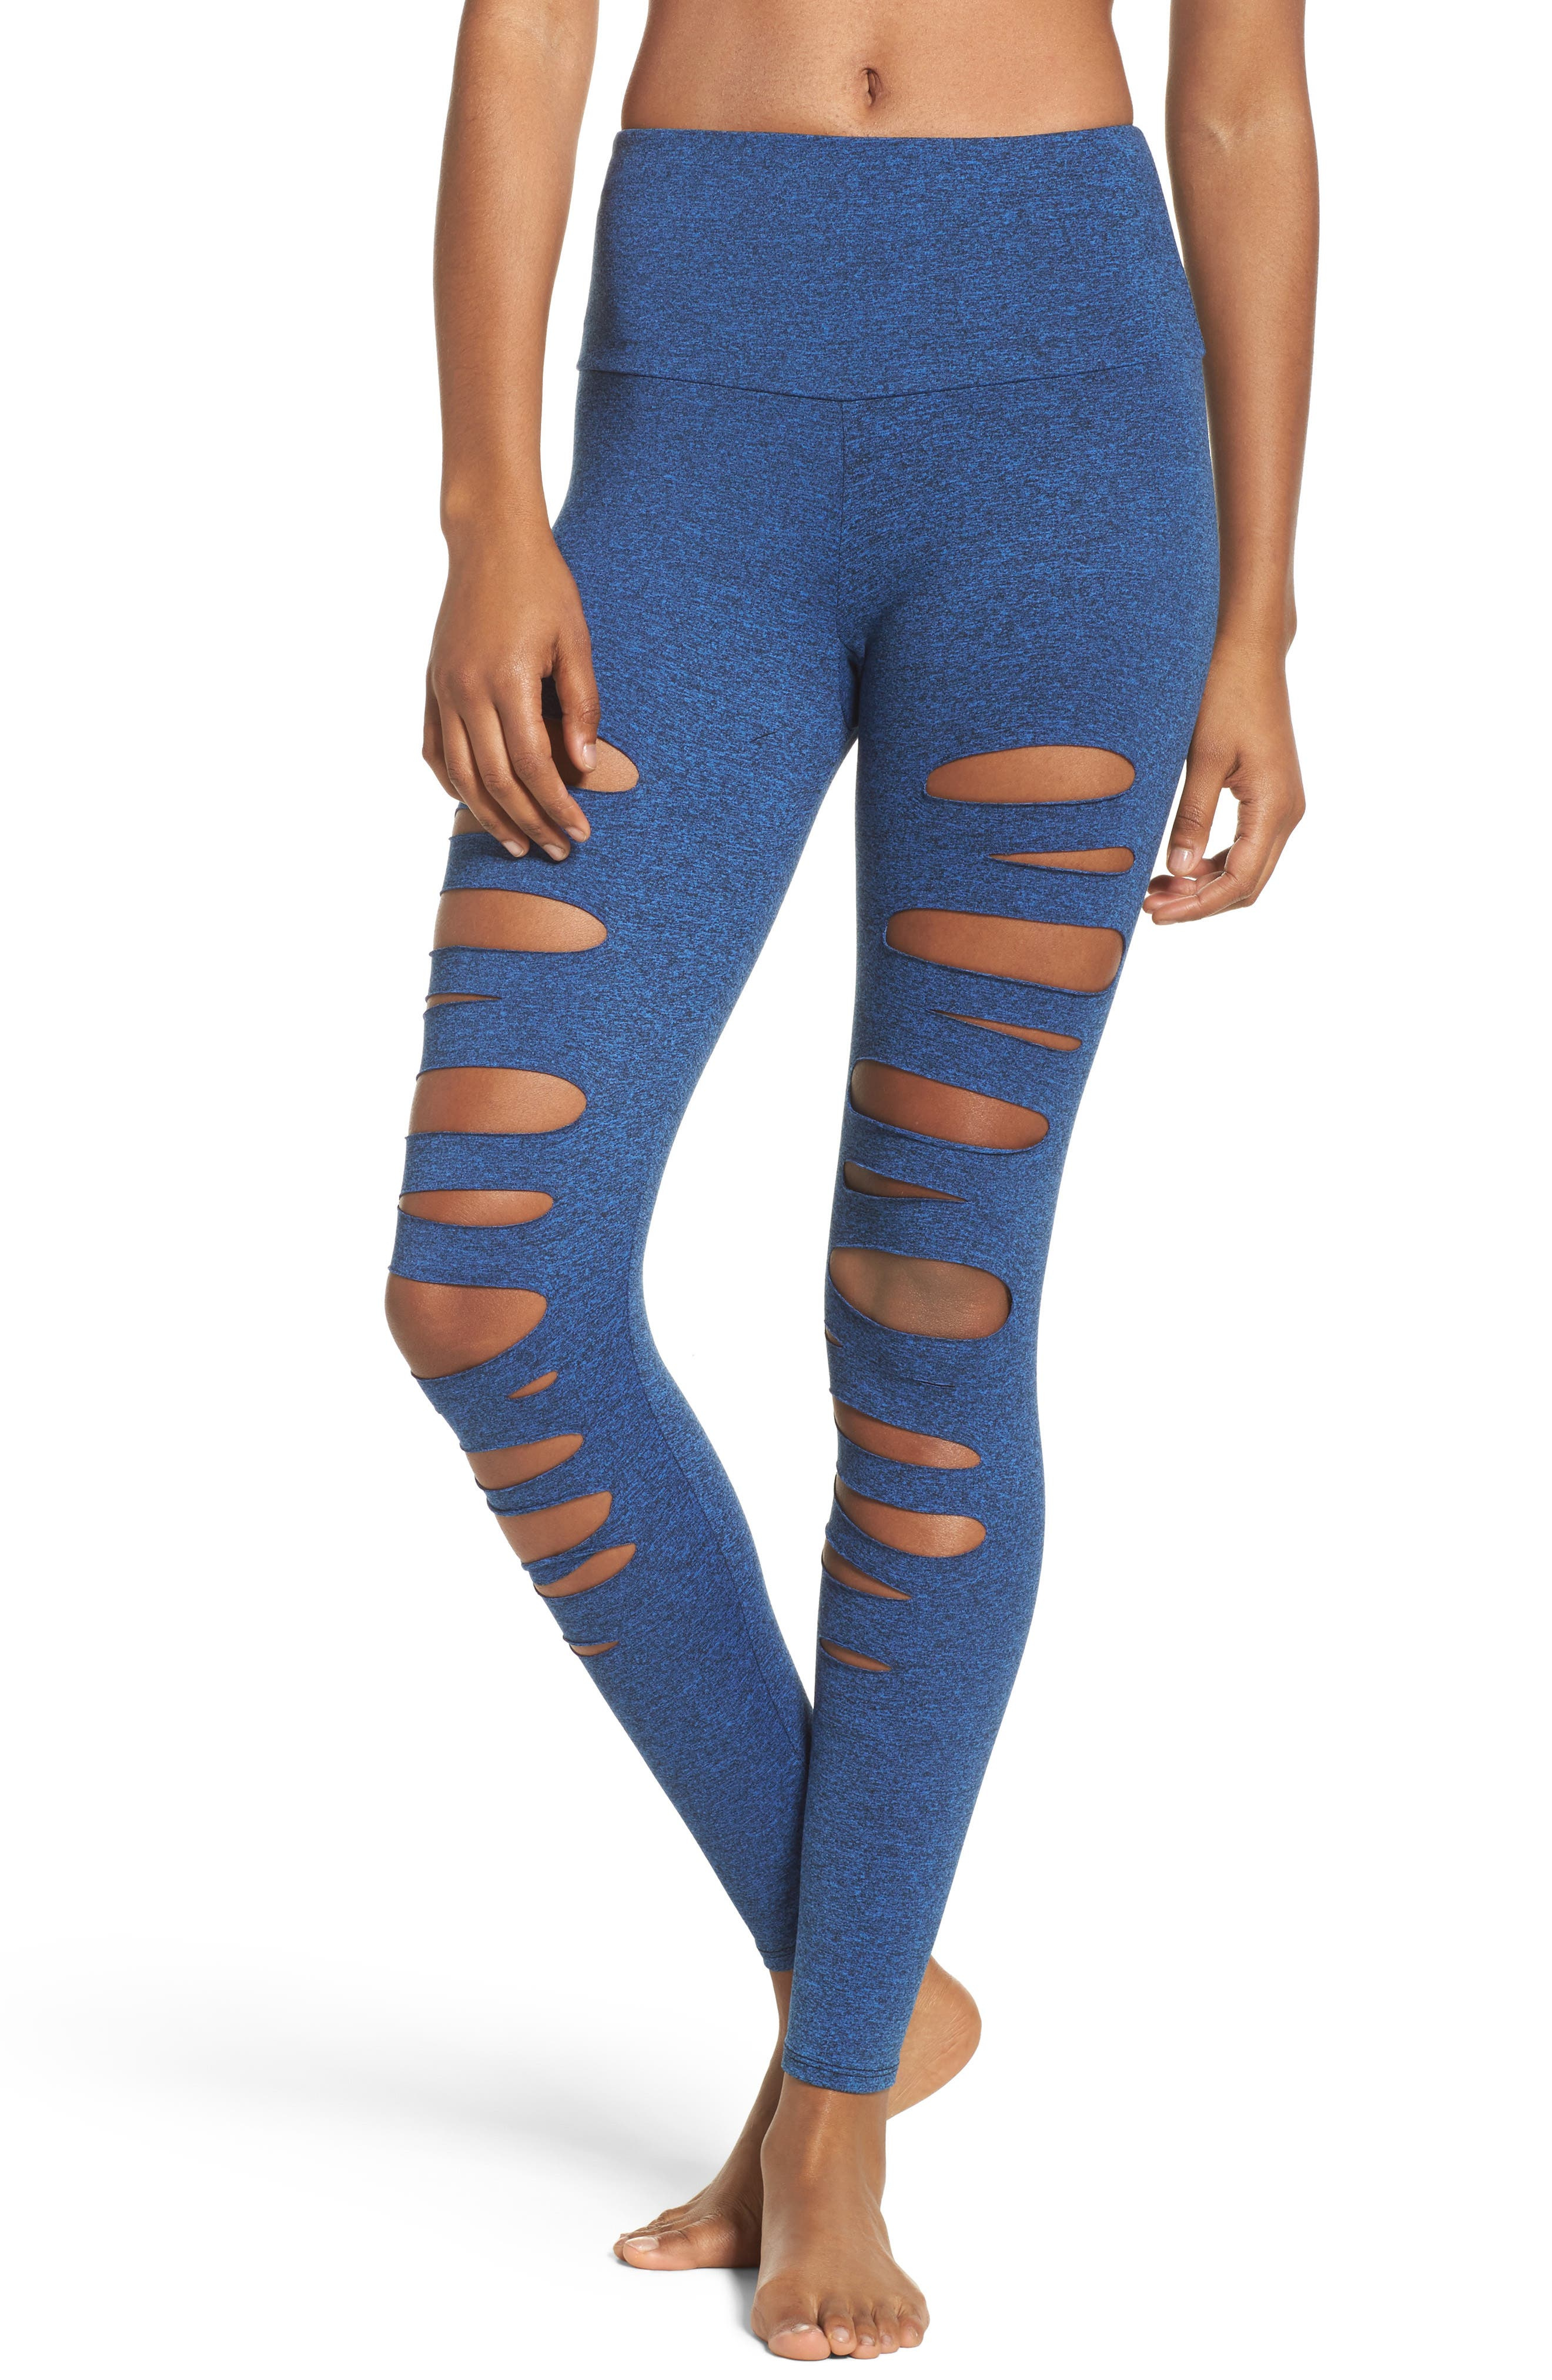 Yoga Apparel High Waist Openwork Leggings,                         Main,                         color, Moonlight Blue Majestic